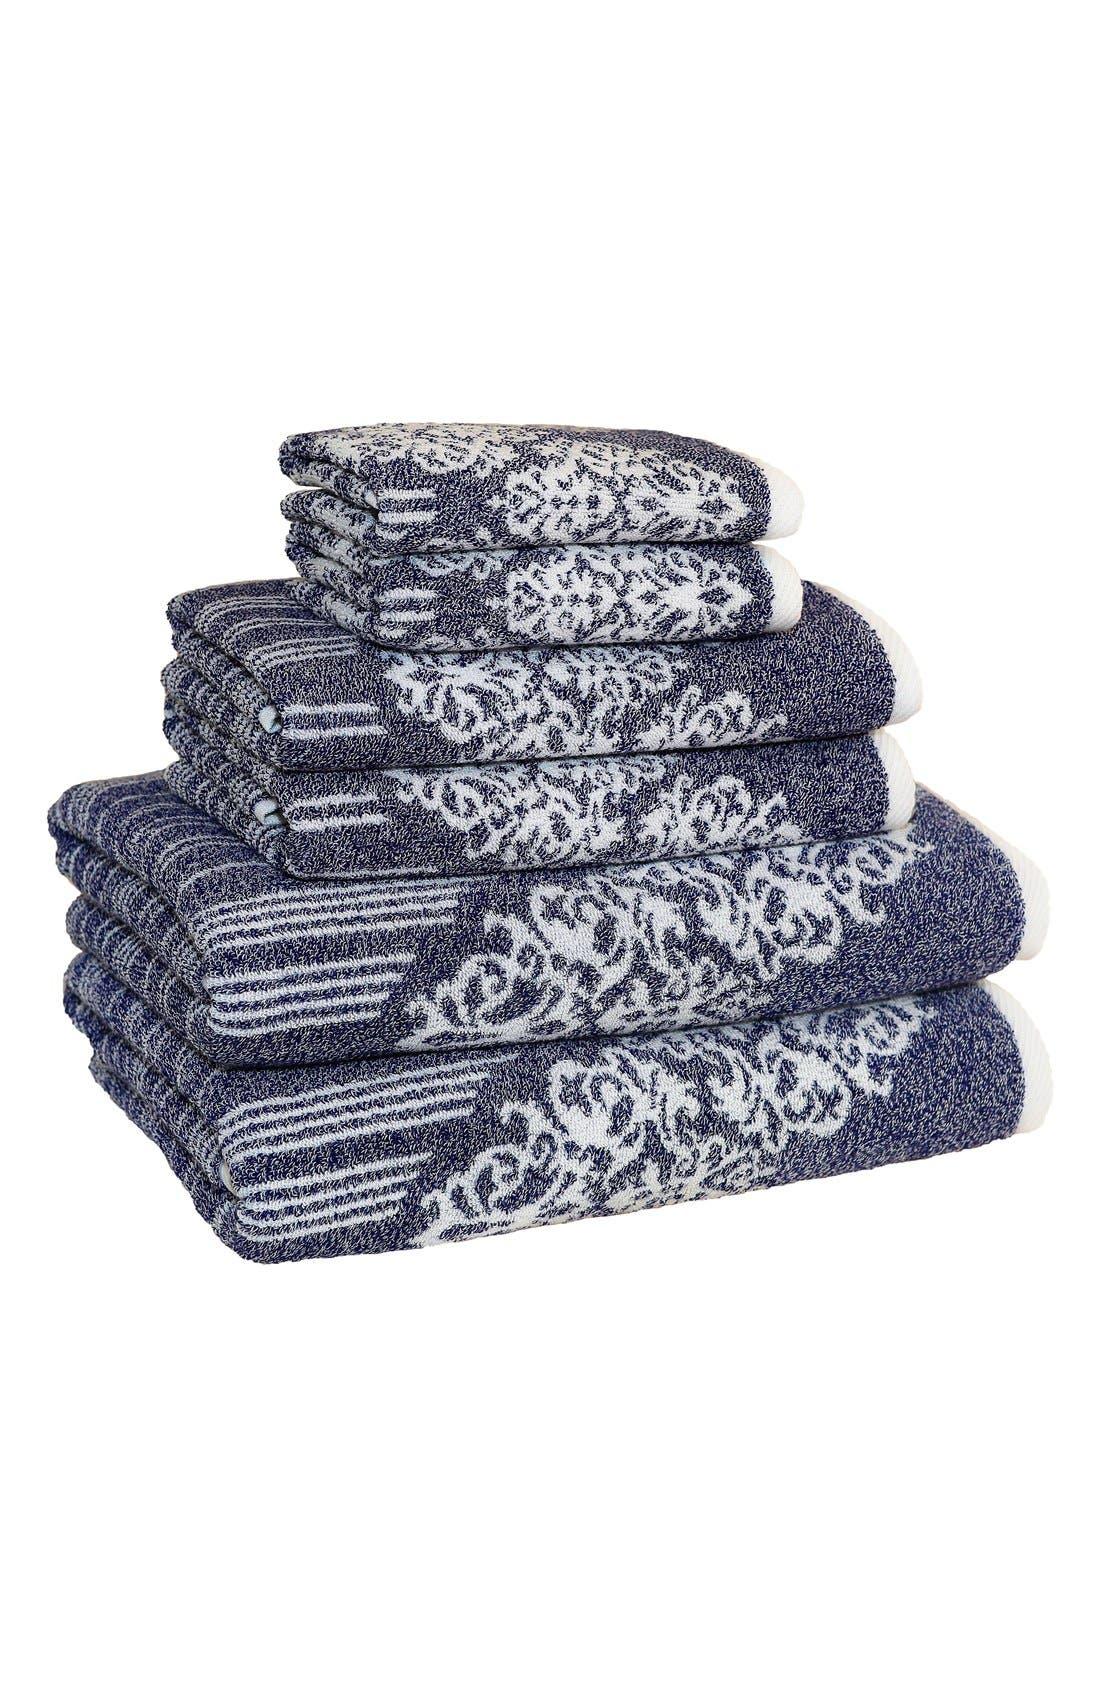 Linum 'Gioia' Bath Towels, Hand Towels & Washcloths,                             Main thumbnail 1, color,                             Ocean Blue